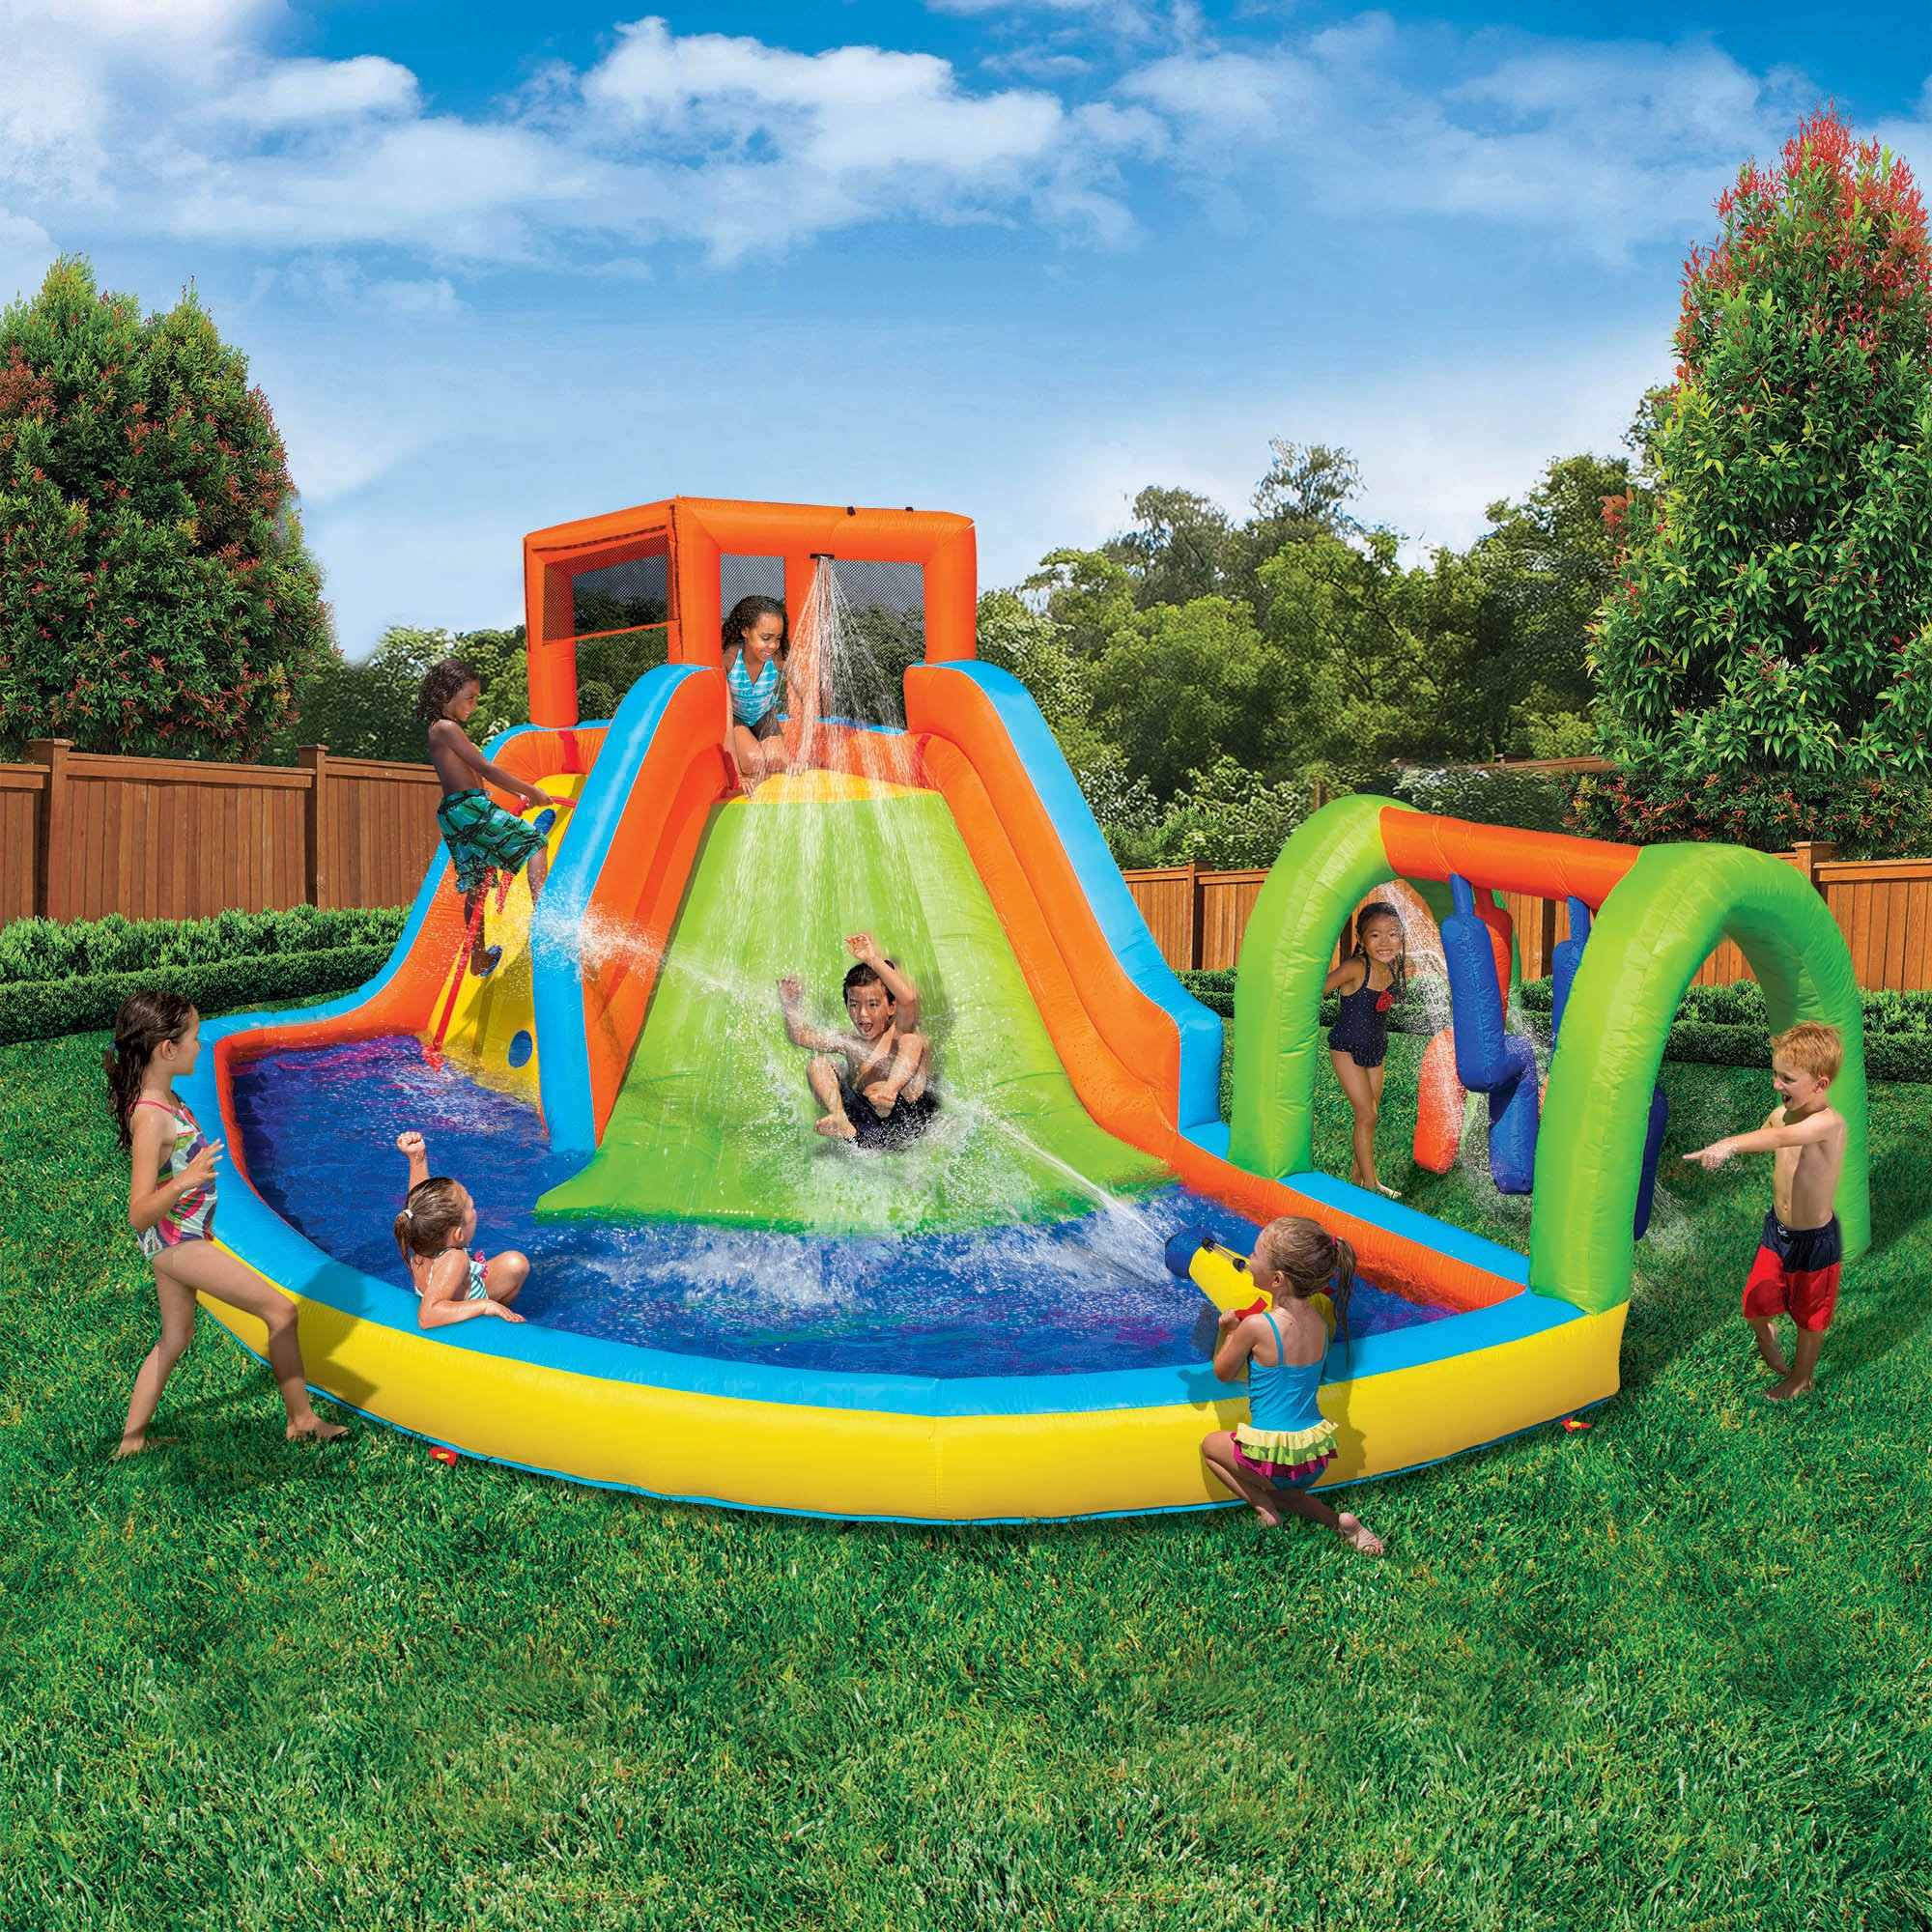 Inflatable Water Slide Toyworld: Banzai Inflatable Summit Splash Adventure Splash Pool